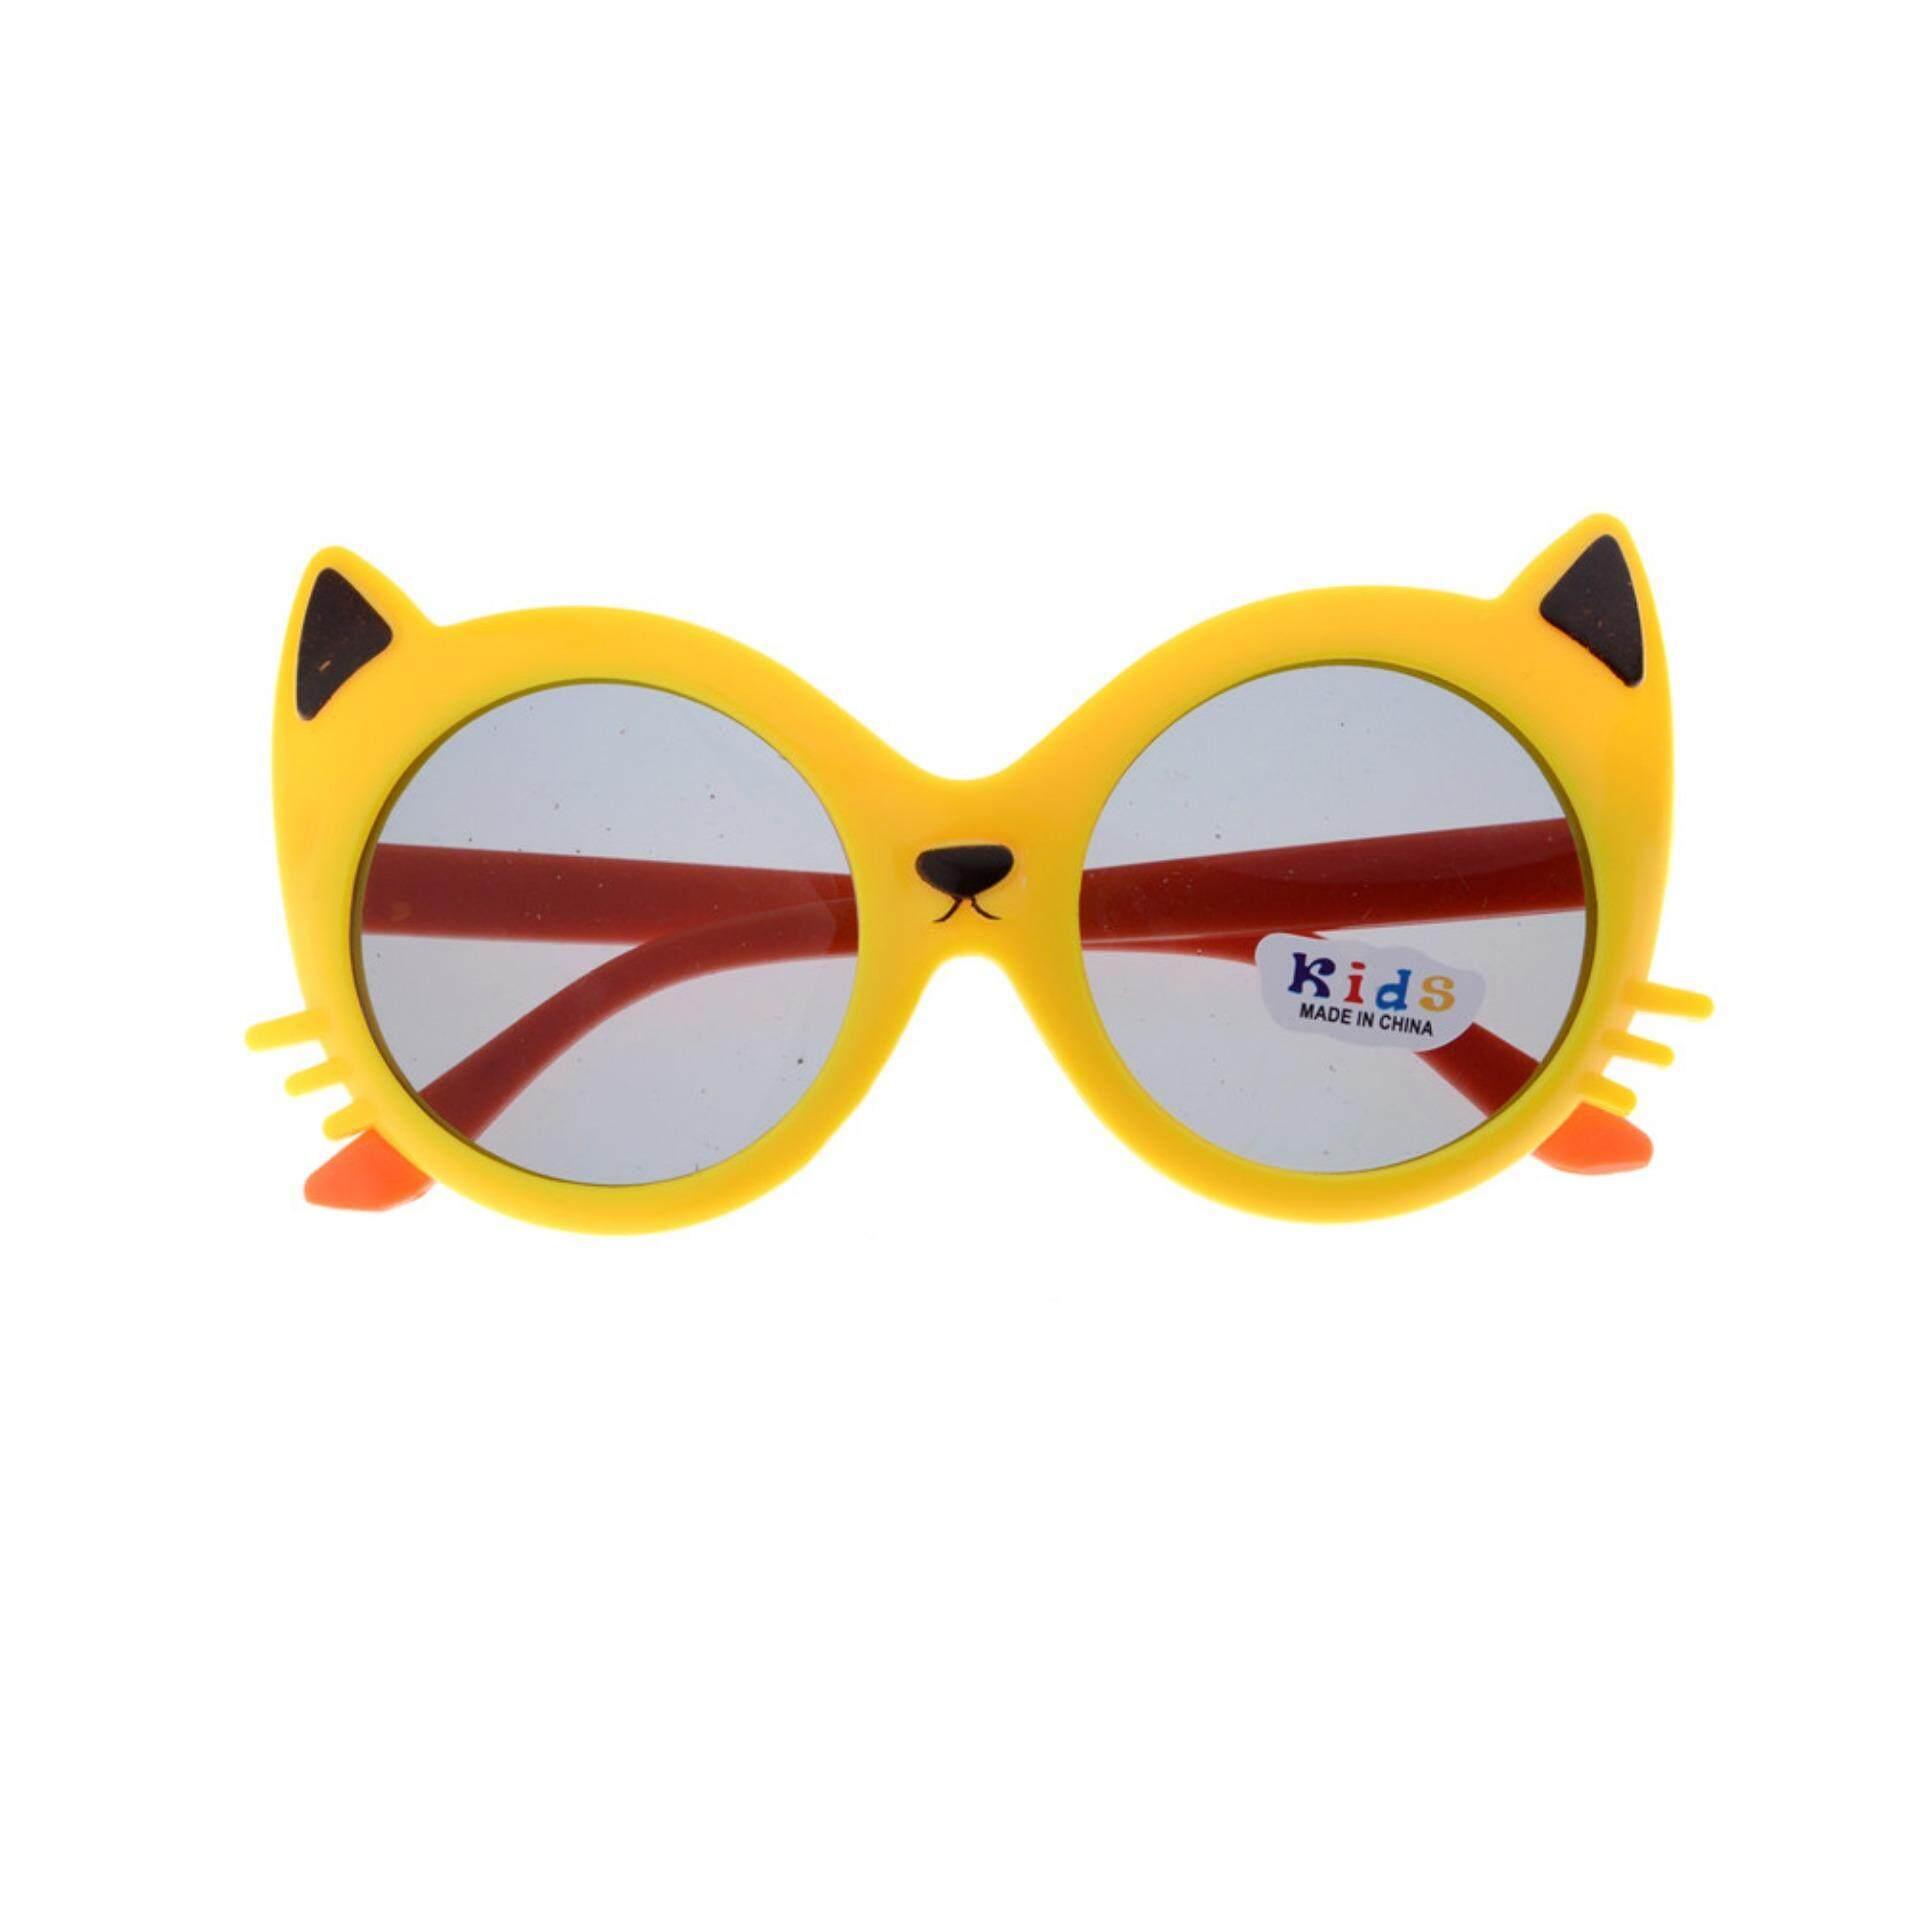 Anak Perempuan Anak Laki-laki Anti UV400 Kacamata Kucing Kartun Balita Bayi  Kacamata Hitam- 2effb7fff8